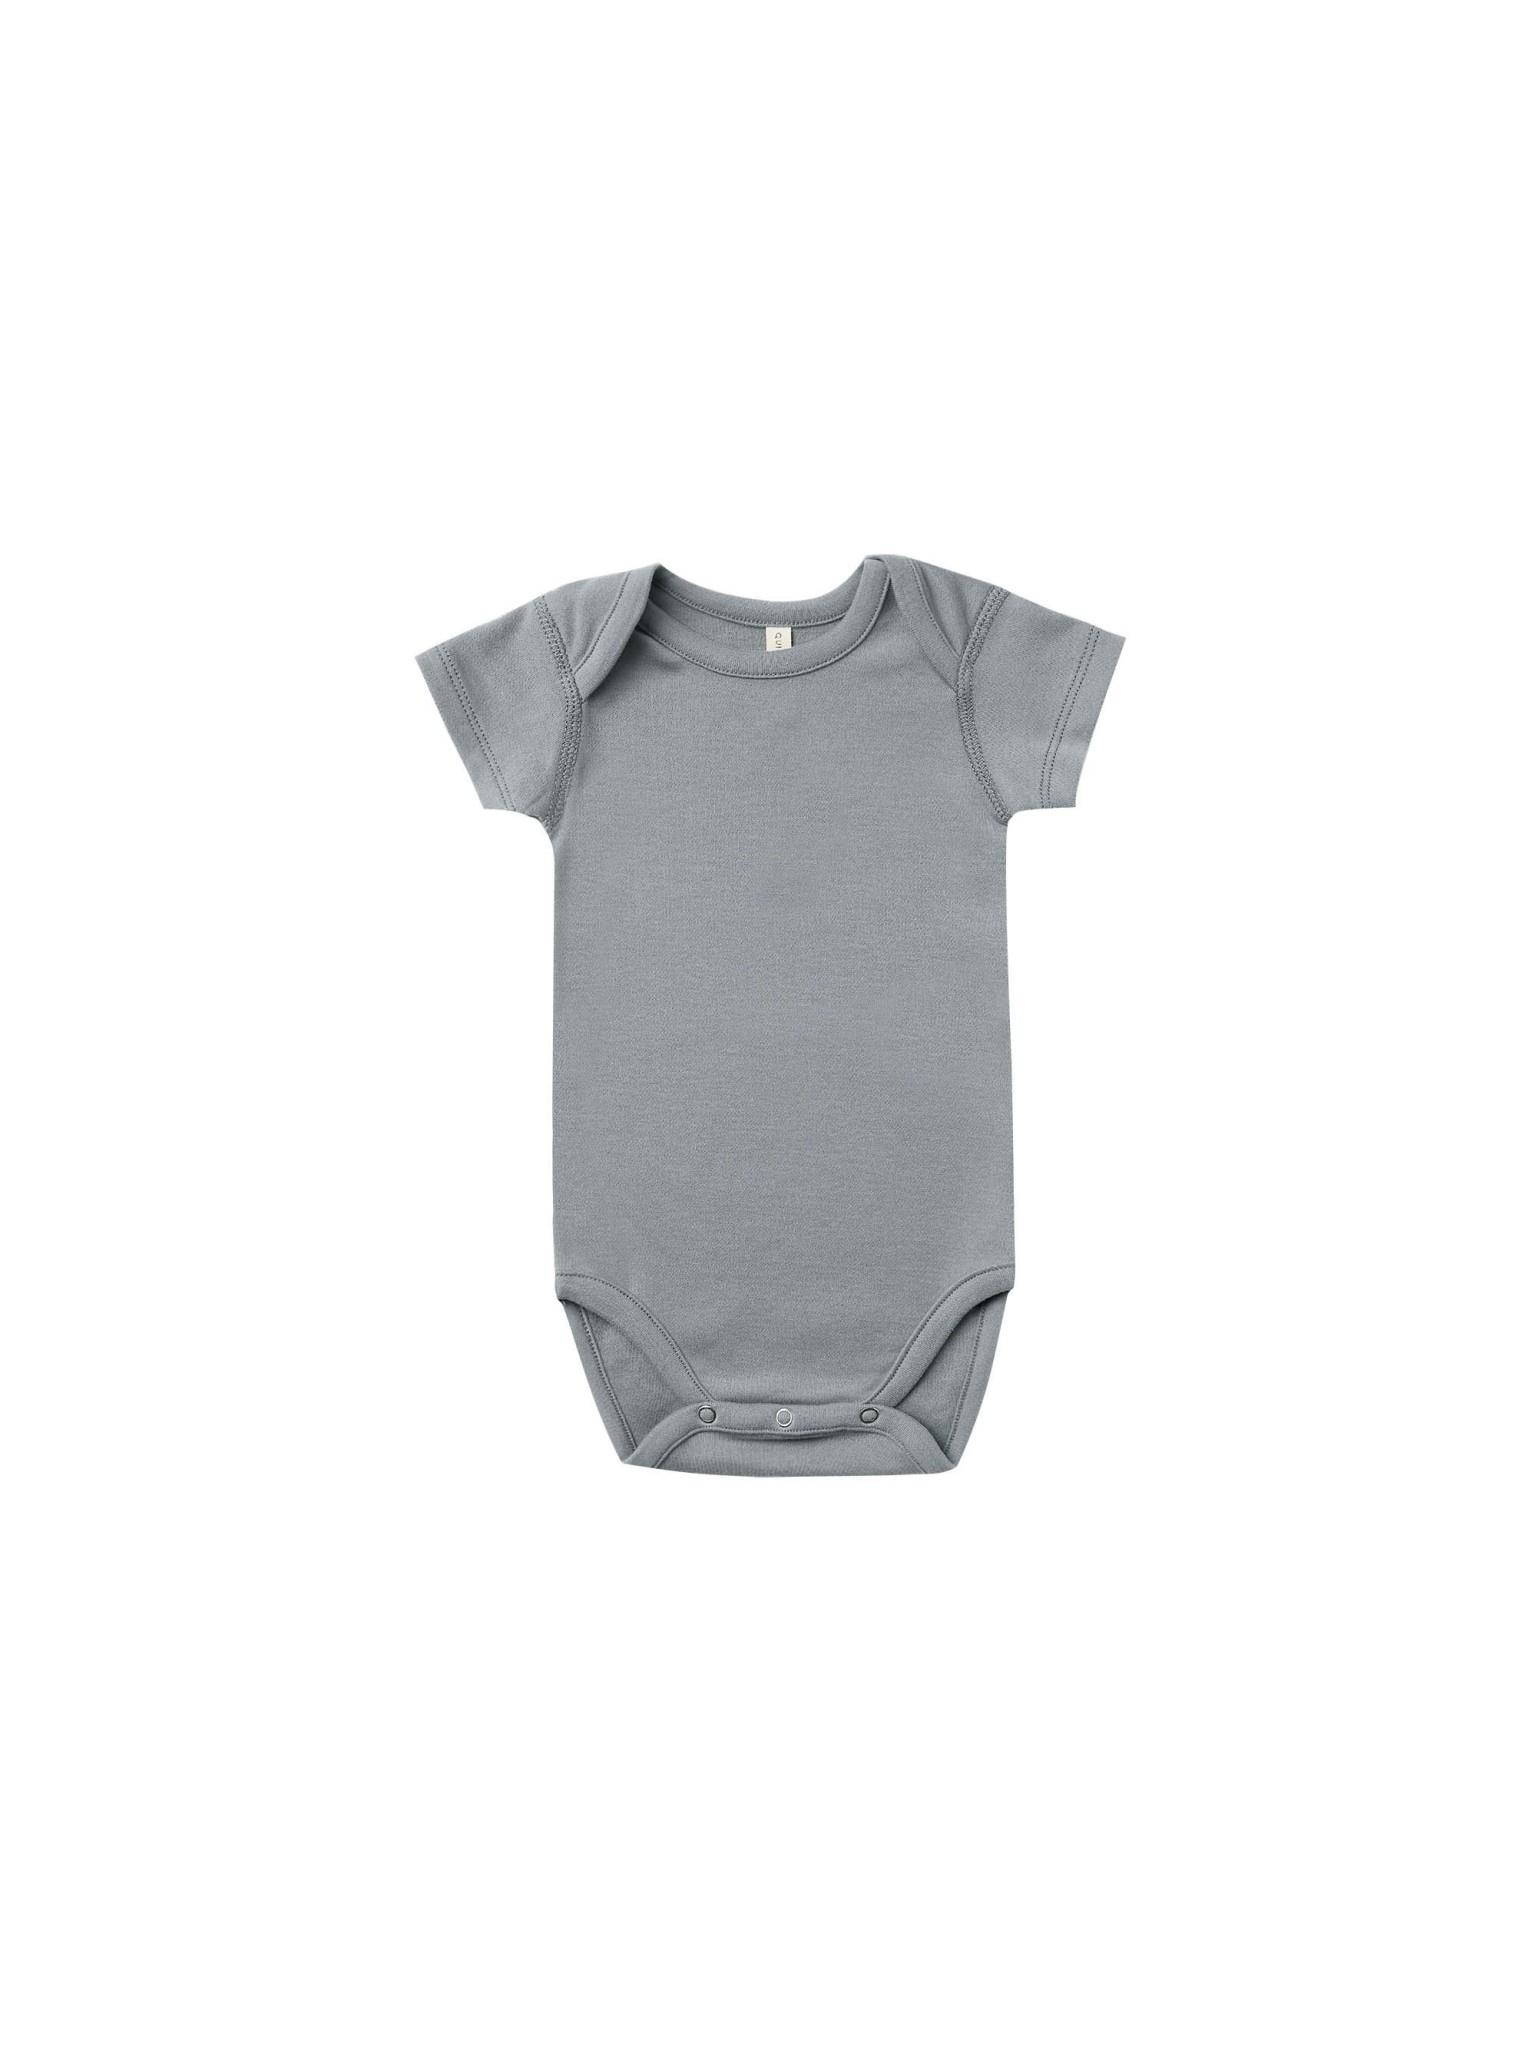 QUINCY MAE Short Sleeve Bodysuit